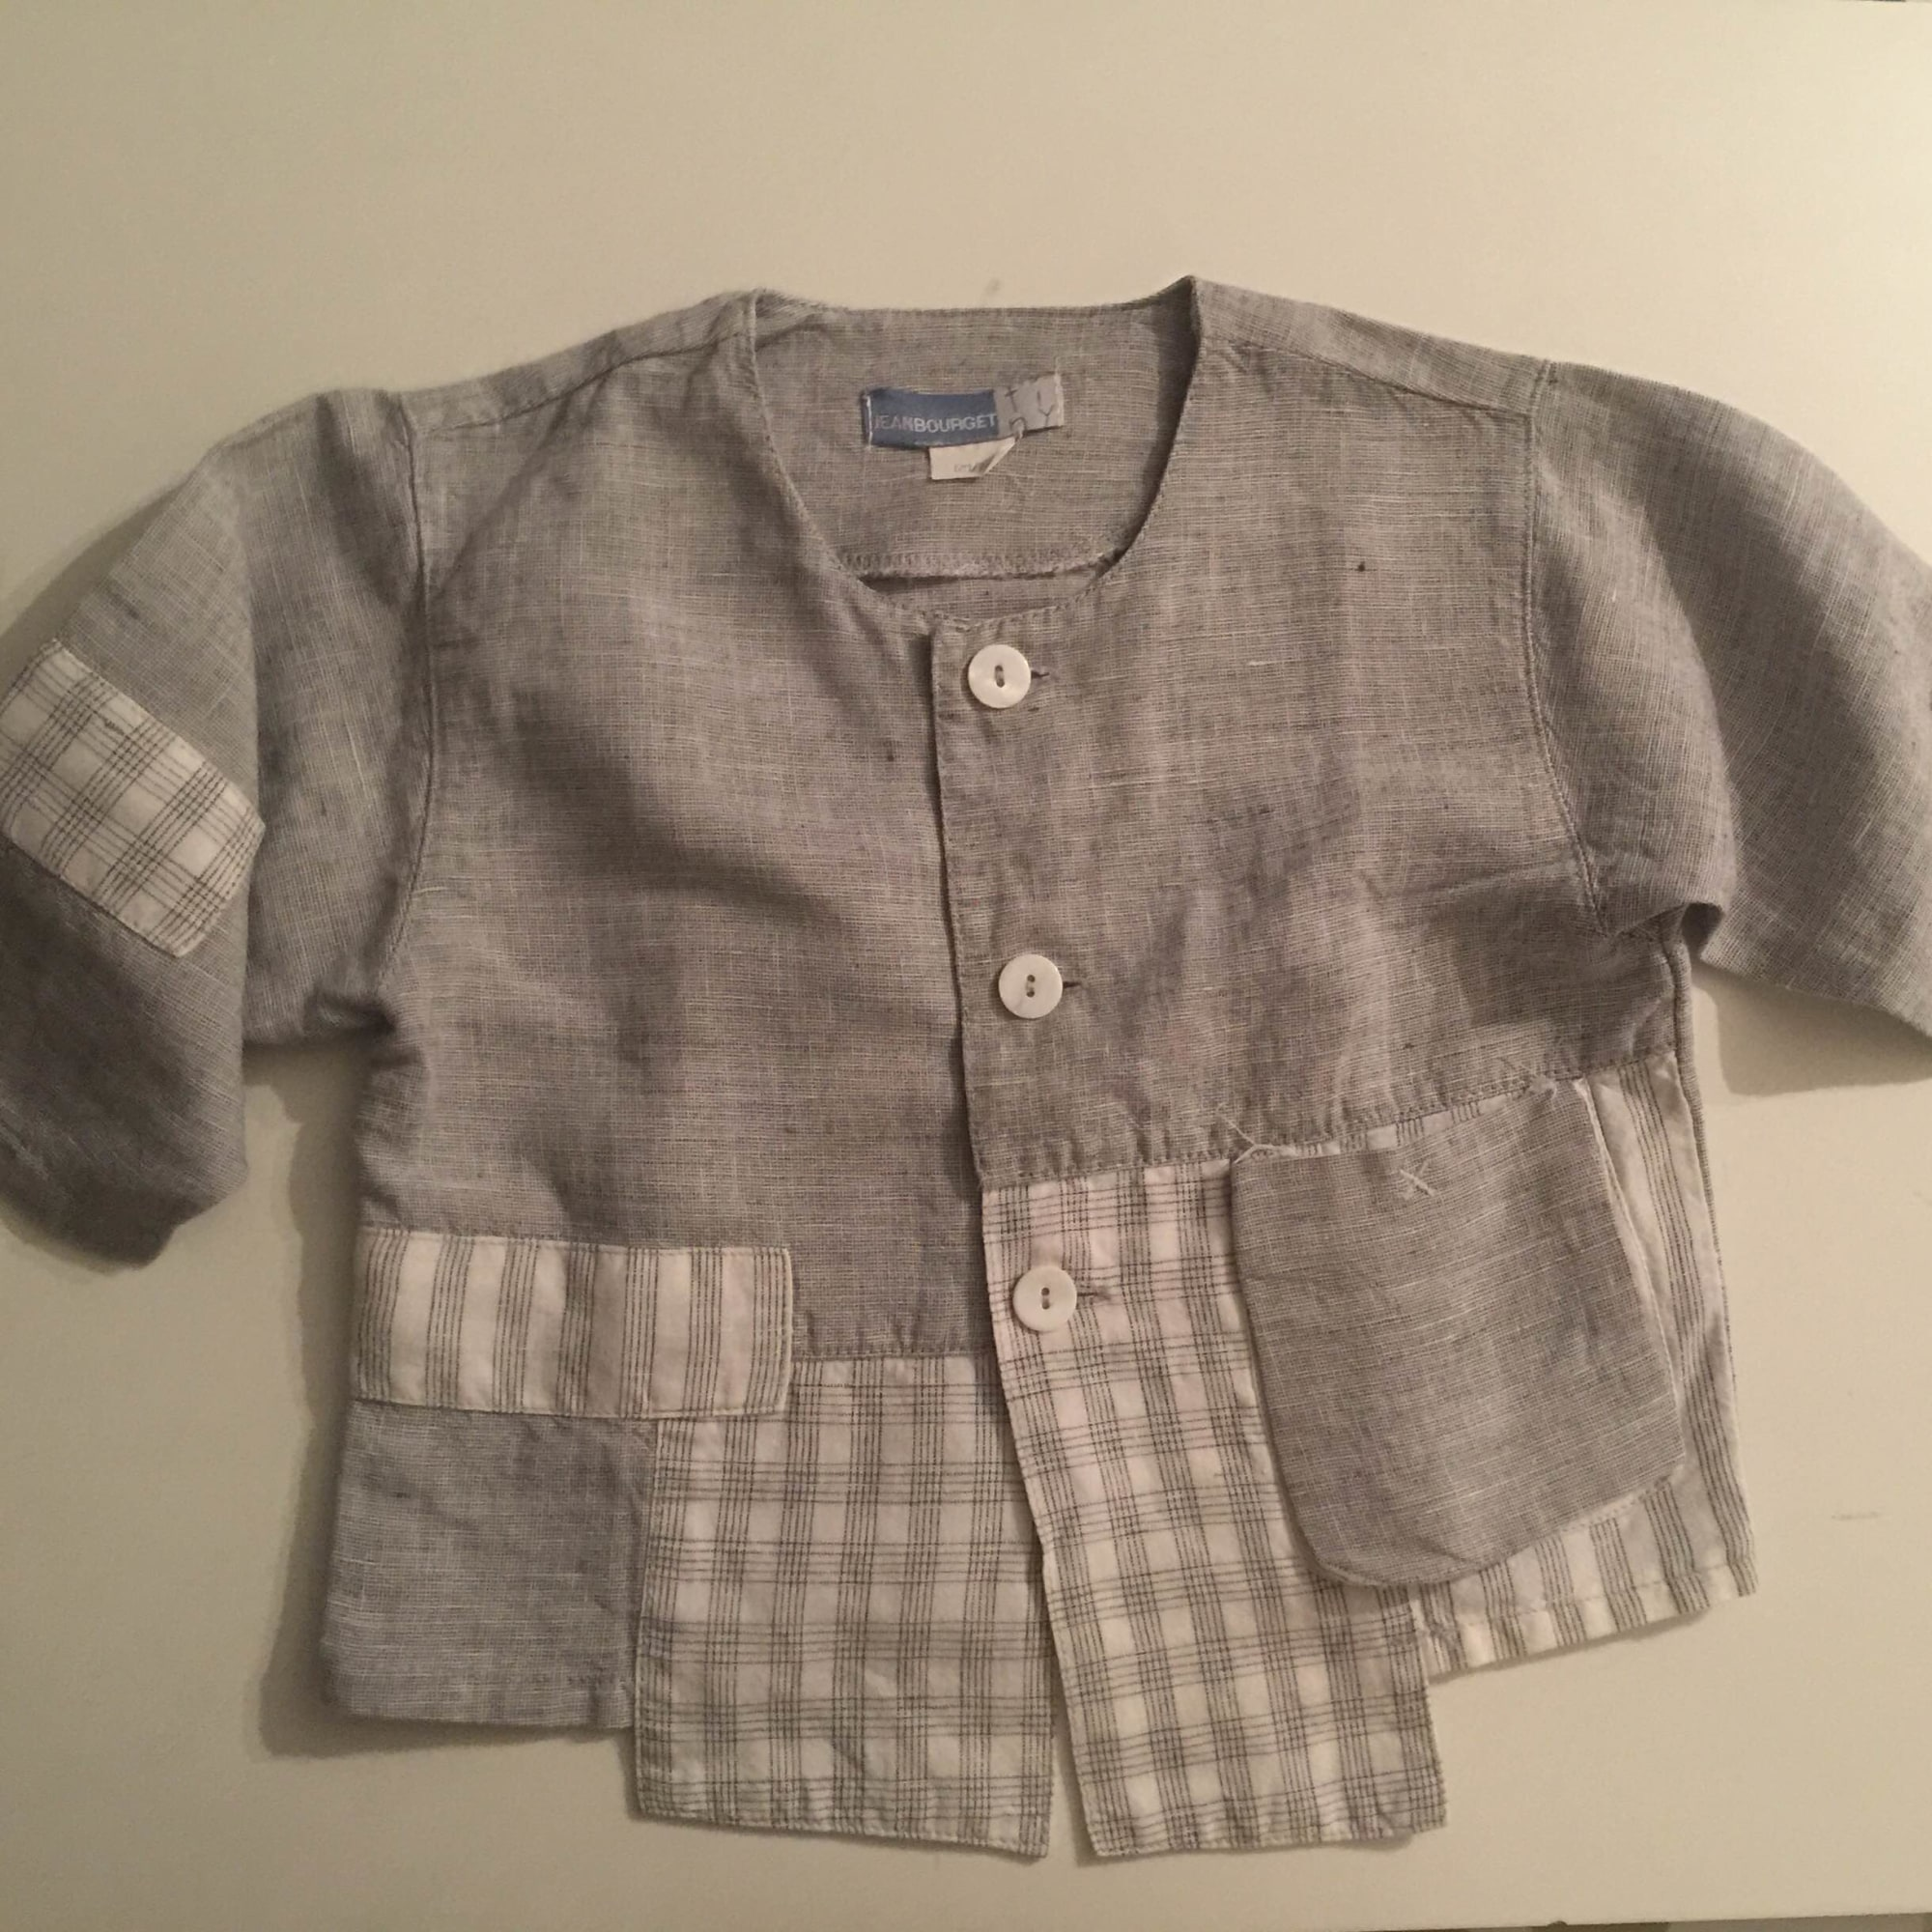 Chemisier, chemisette JEAN BOURGET Gris, anthracite